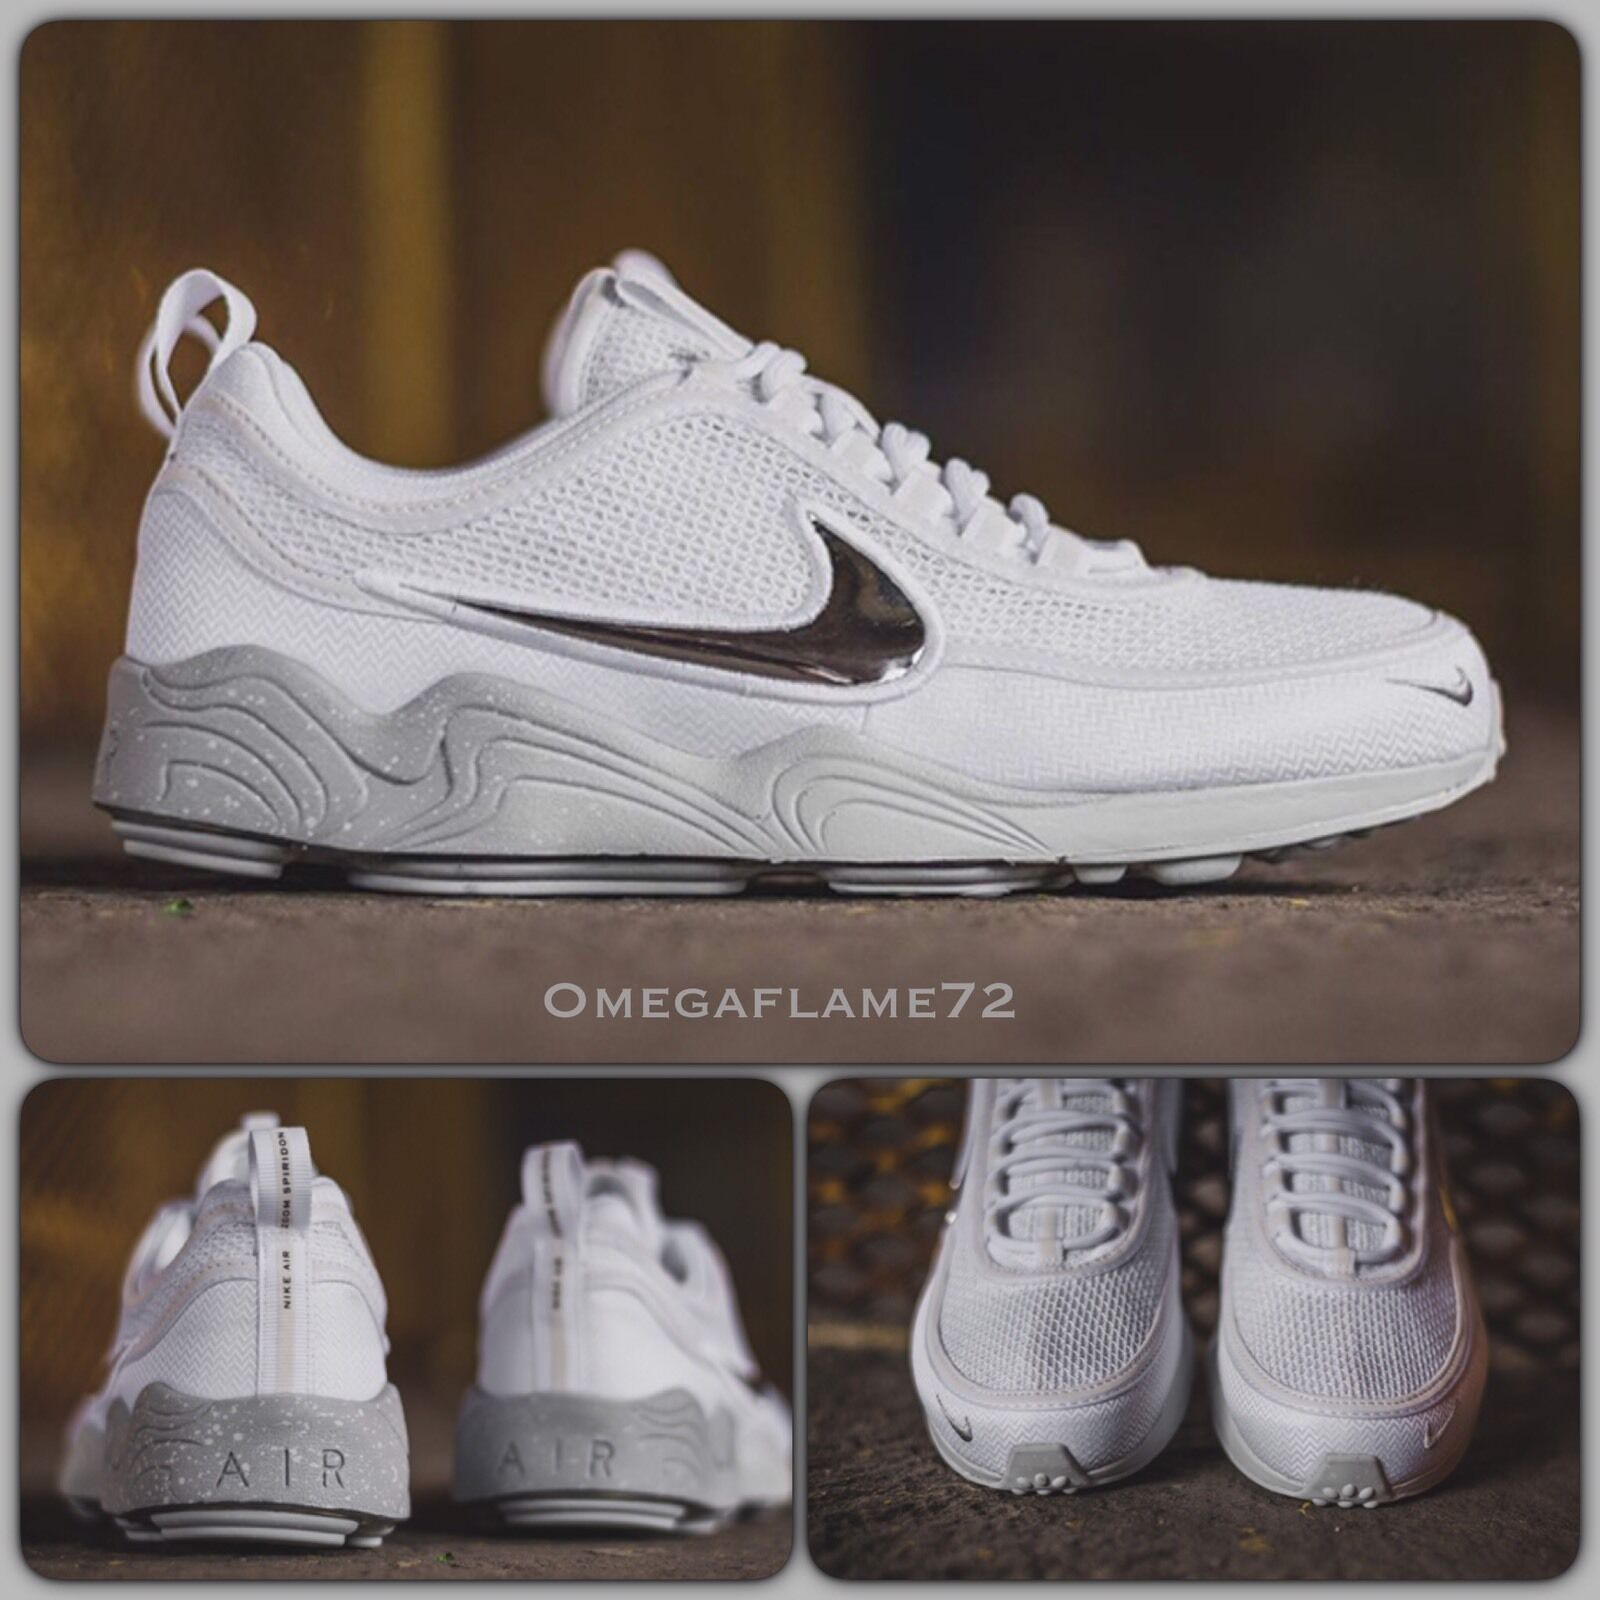 NikeLab Zoom Spiridon White Silver, 849776-100, US 8.5 nike